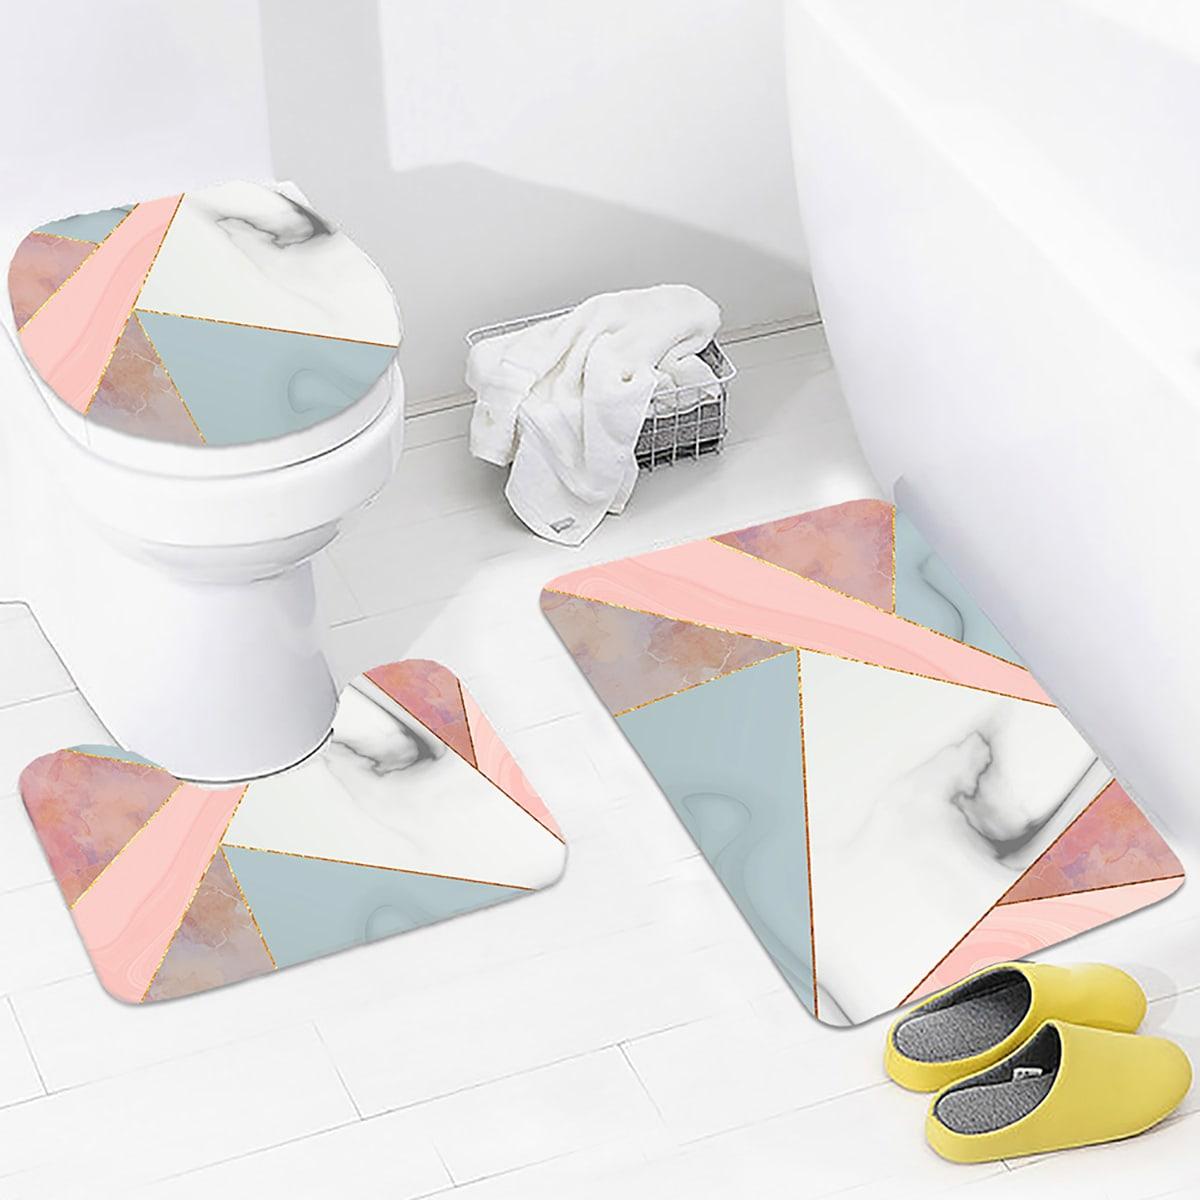 1 Stück Closestool Matte mit Geometrie Muster